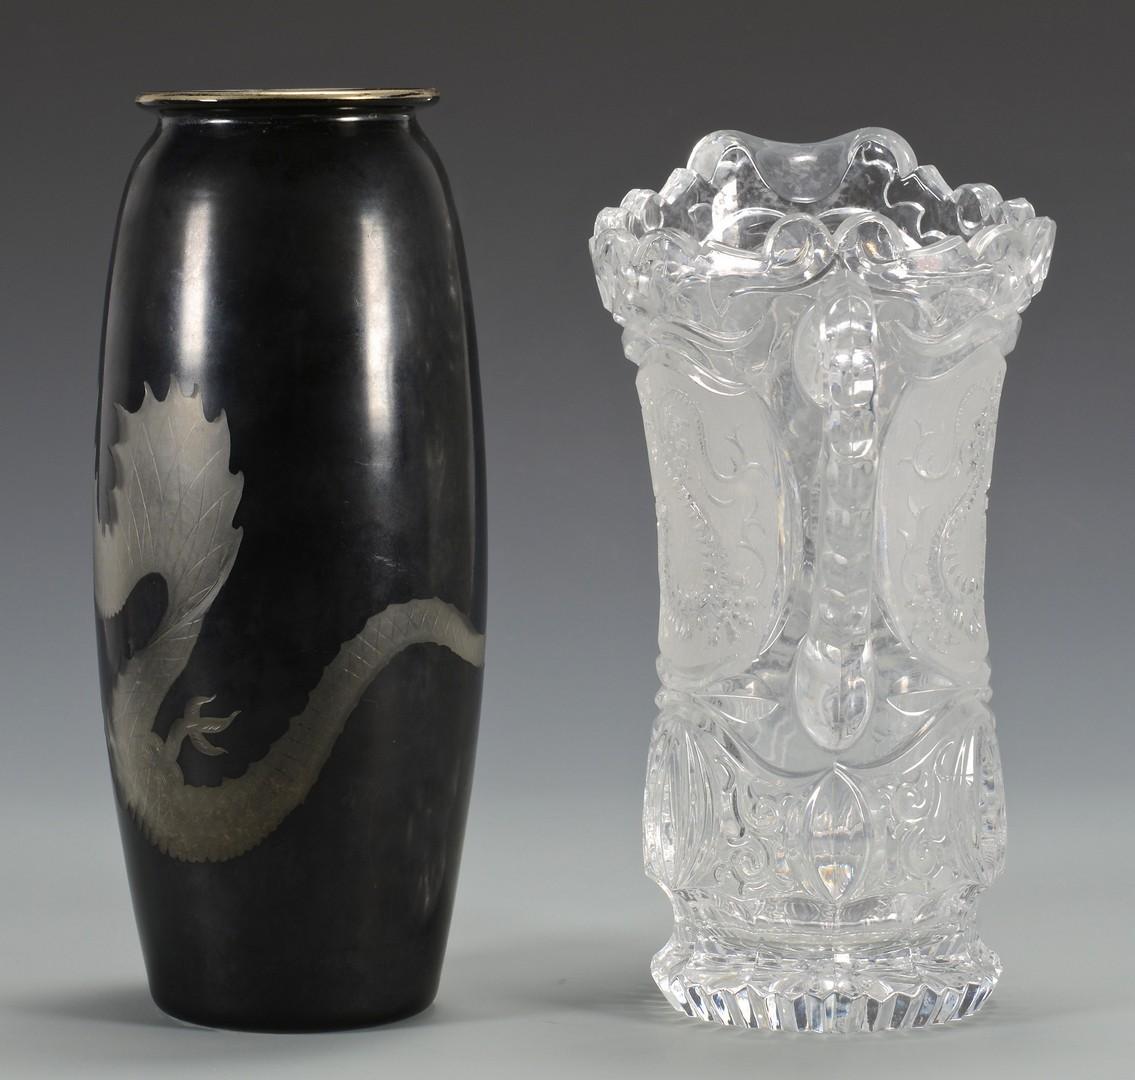 Lot 3594175: Glass Pitcher & Vase w/ Dragon Design